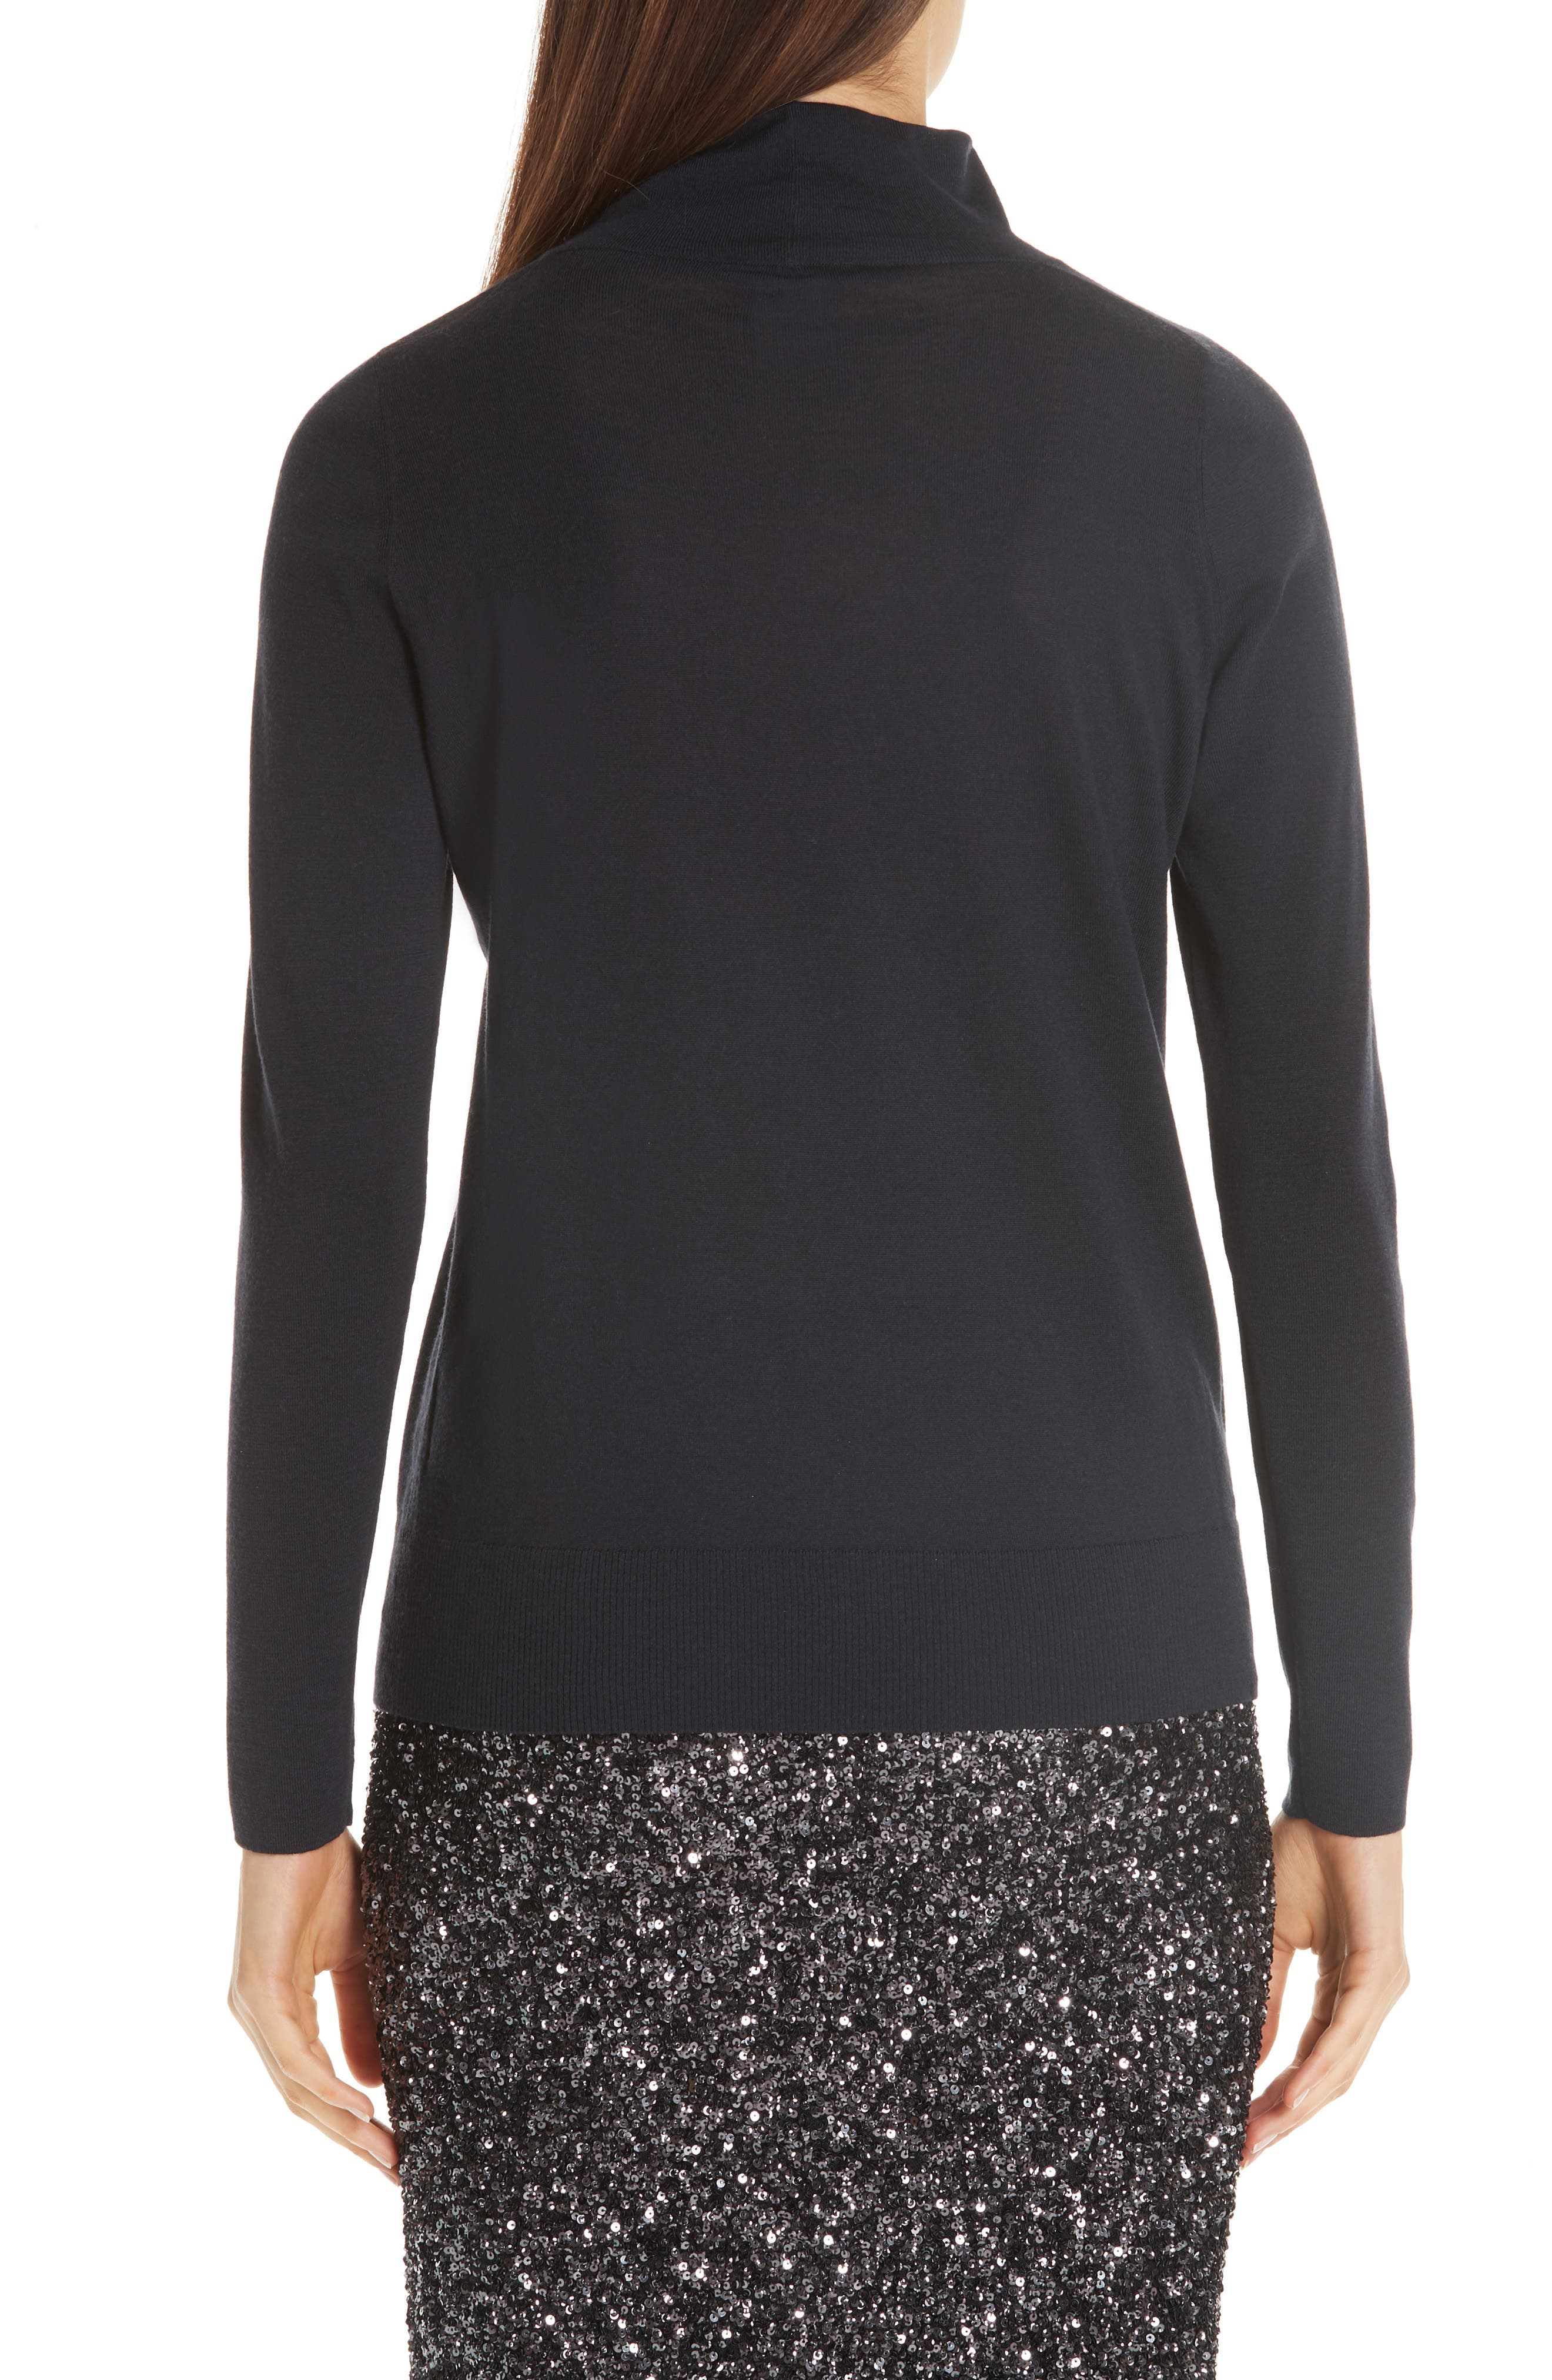 Merino Wool Modern Turtleneck Sweater,                             Alternate thumbnail 2, color,                             479